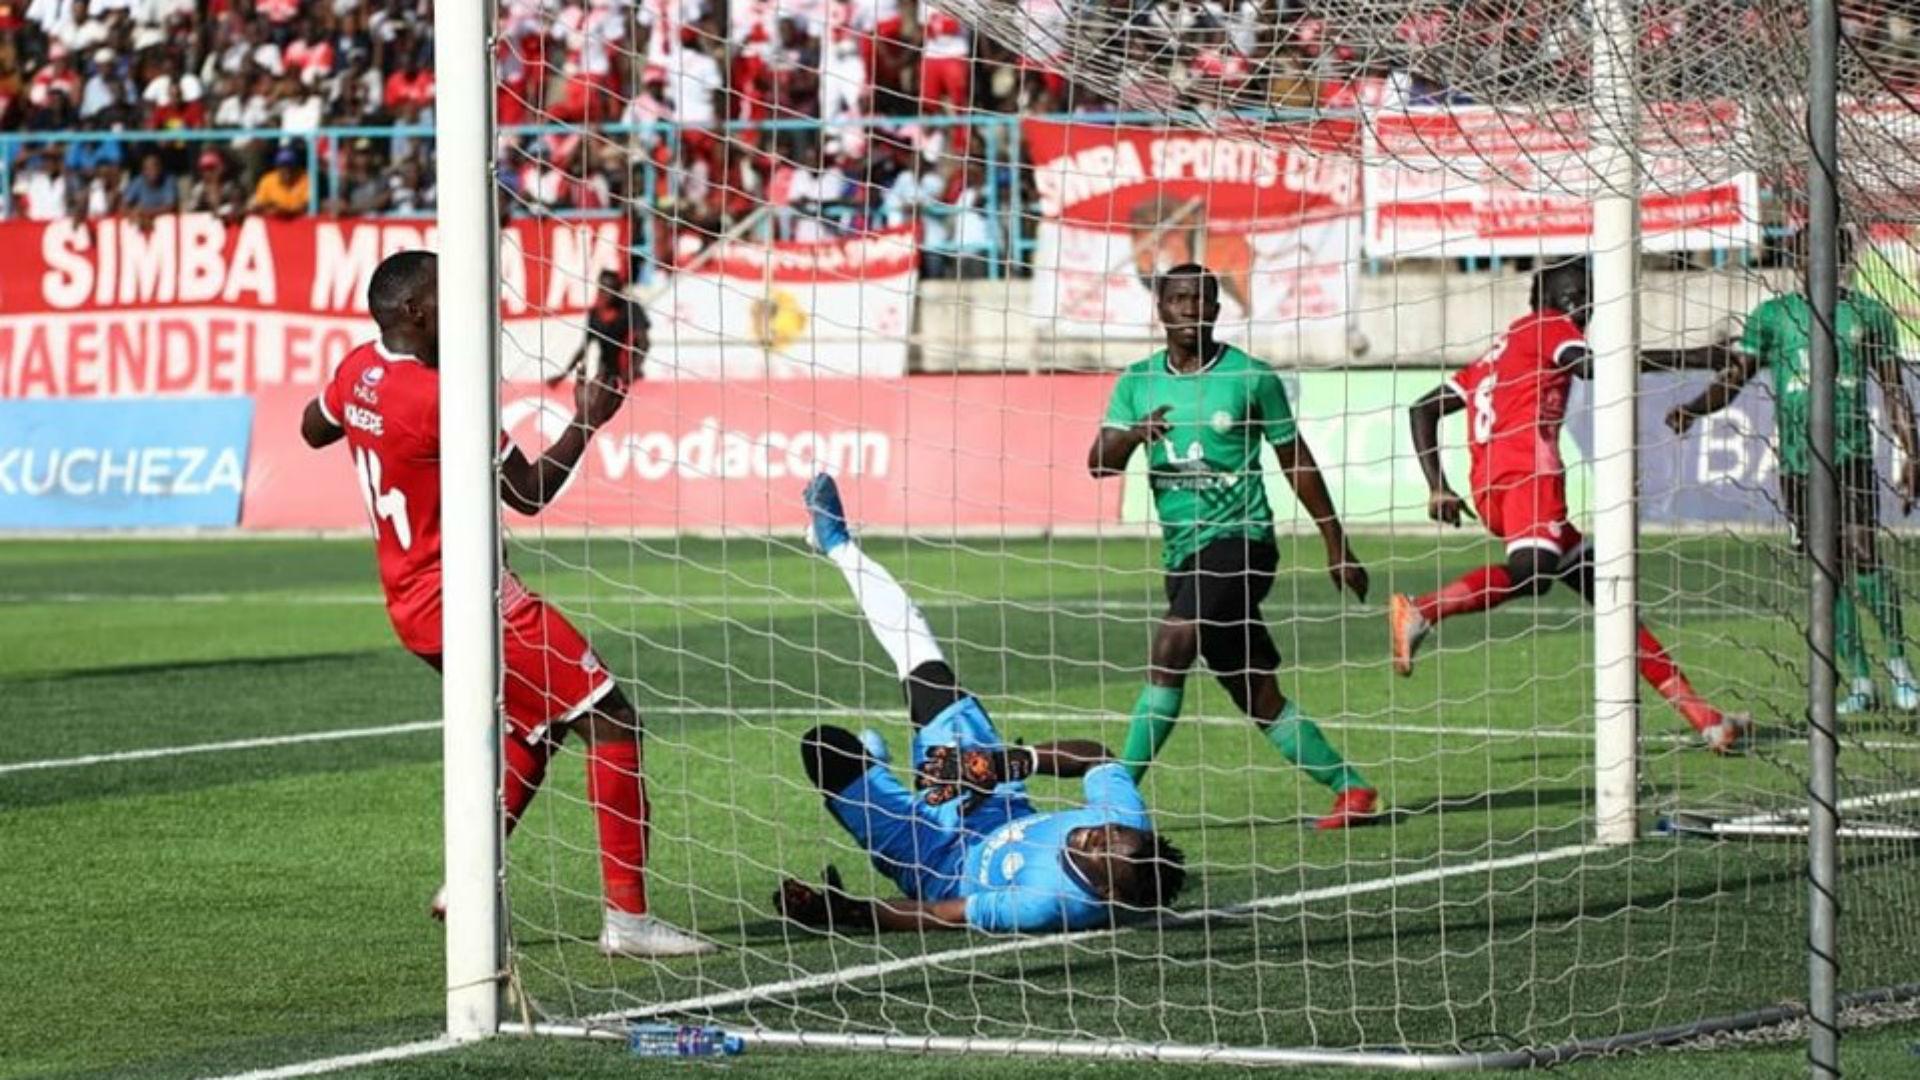 Luhende boasts Kagera Sugar know Simba SC's weakness